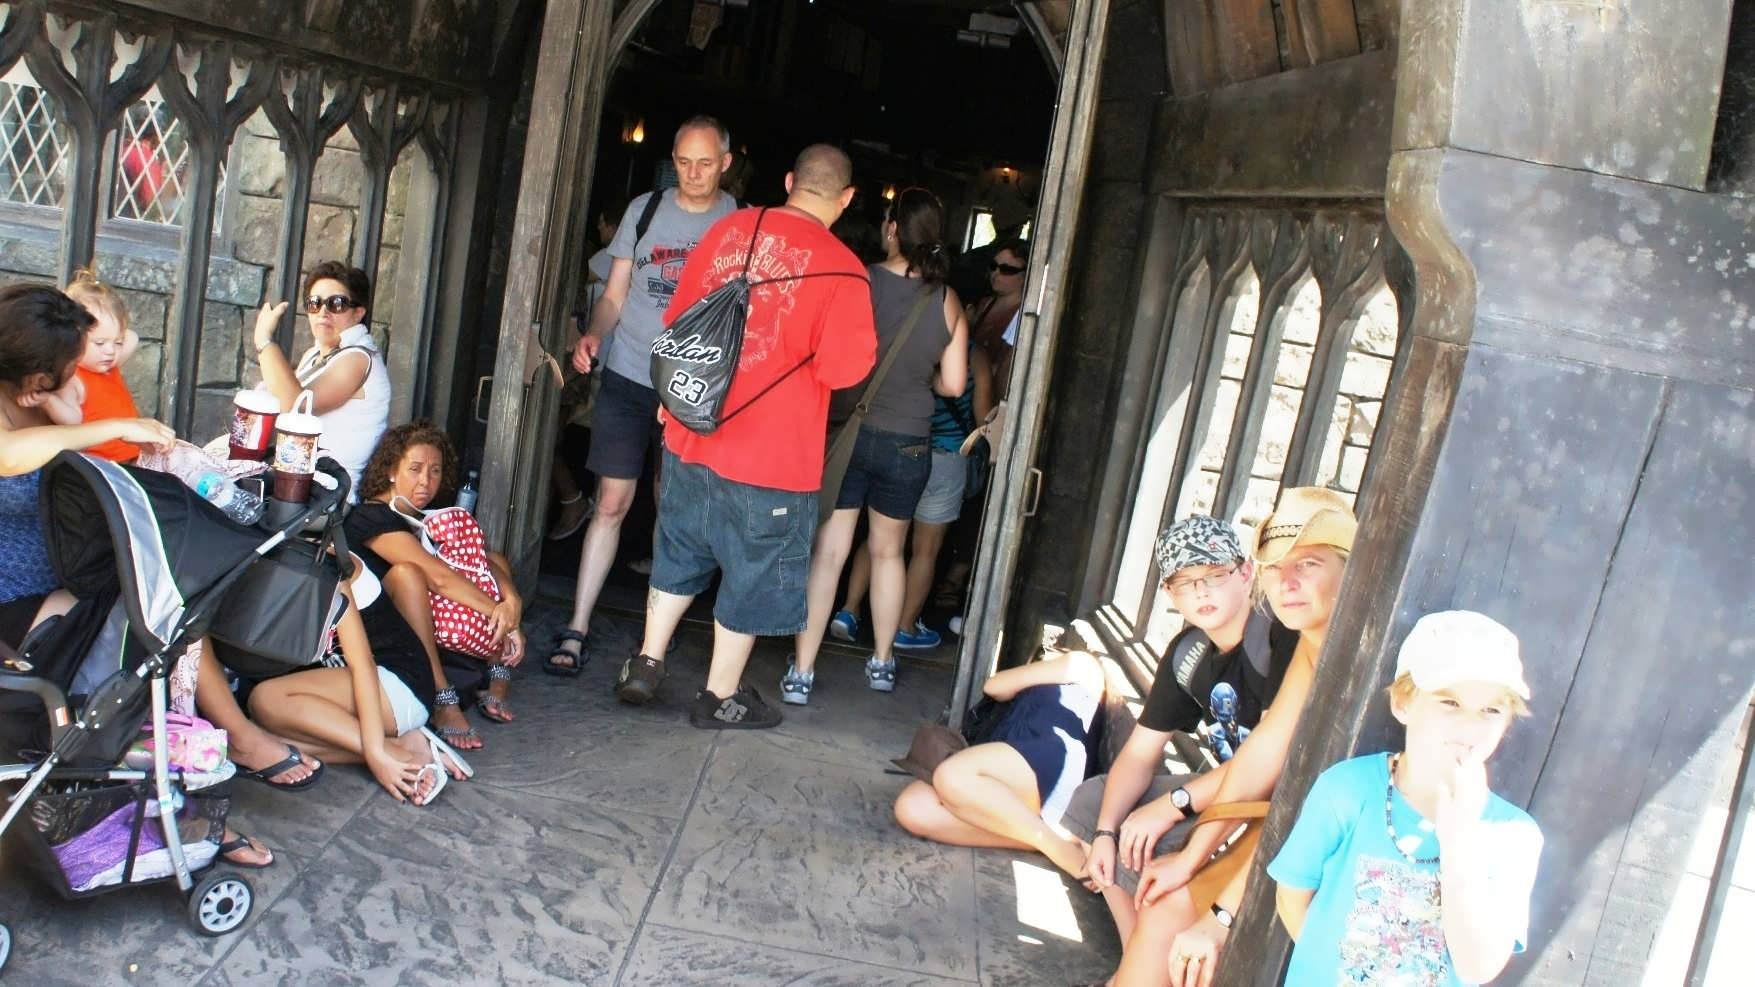 Crowded Hogsmeade